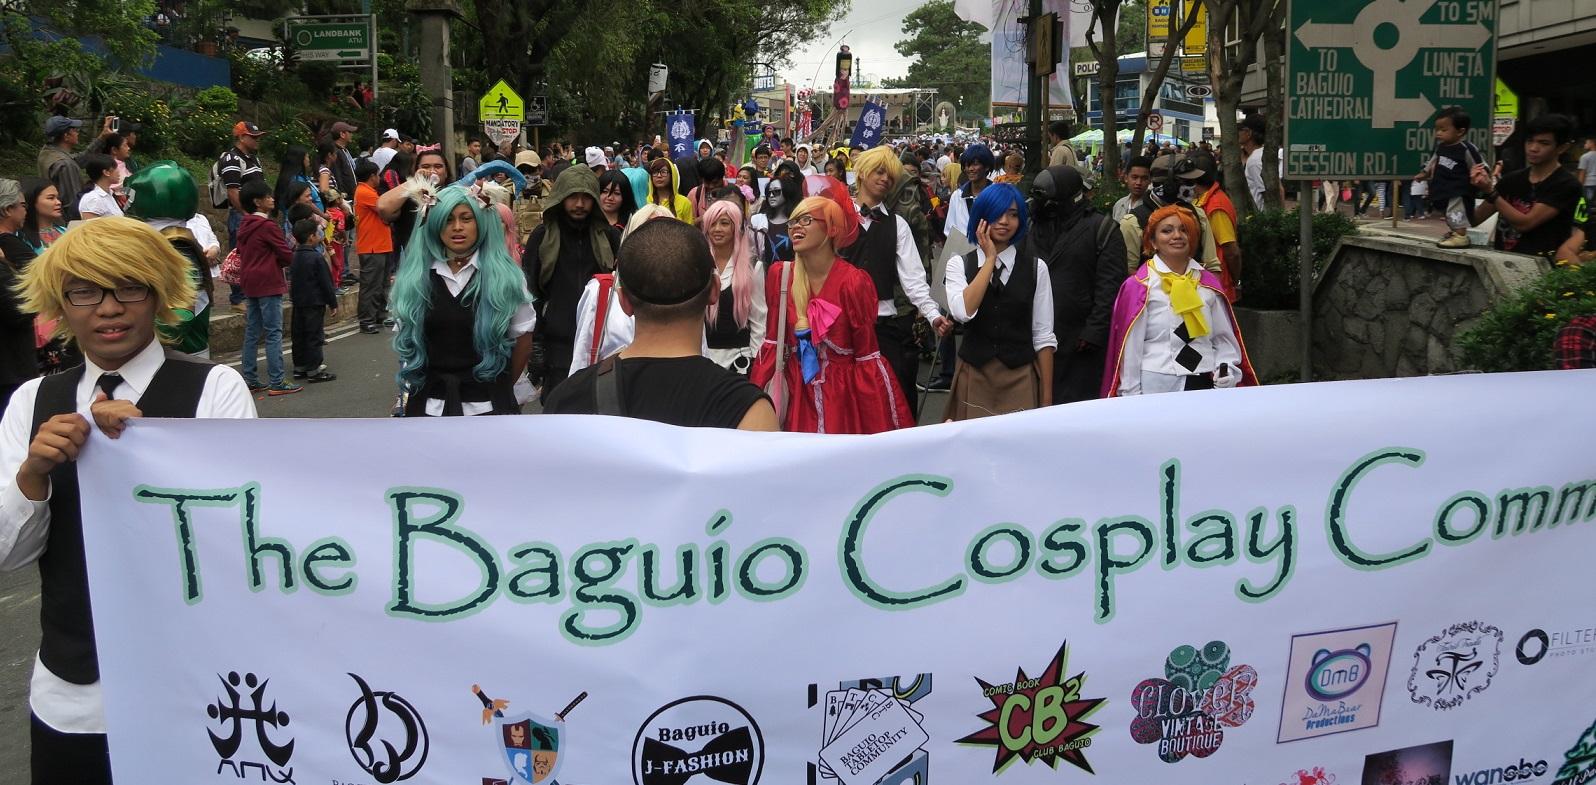 BAGUIO DAY PARADE 2015 バギオ市制106周年記念パレードに伊達政宗と七夕飾りが参加_a0109542_17482194.jpg